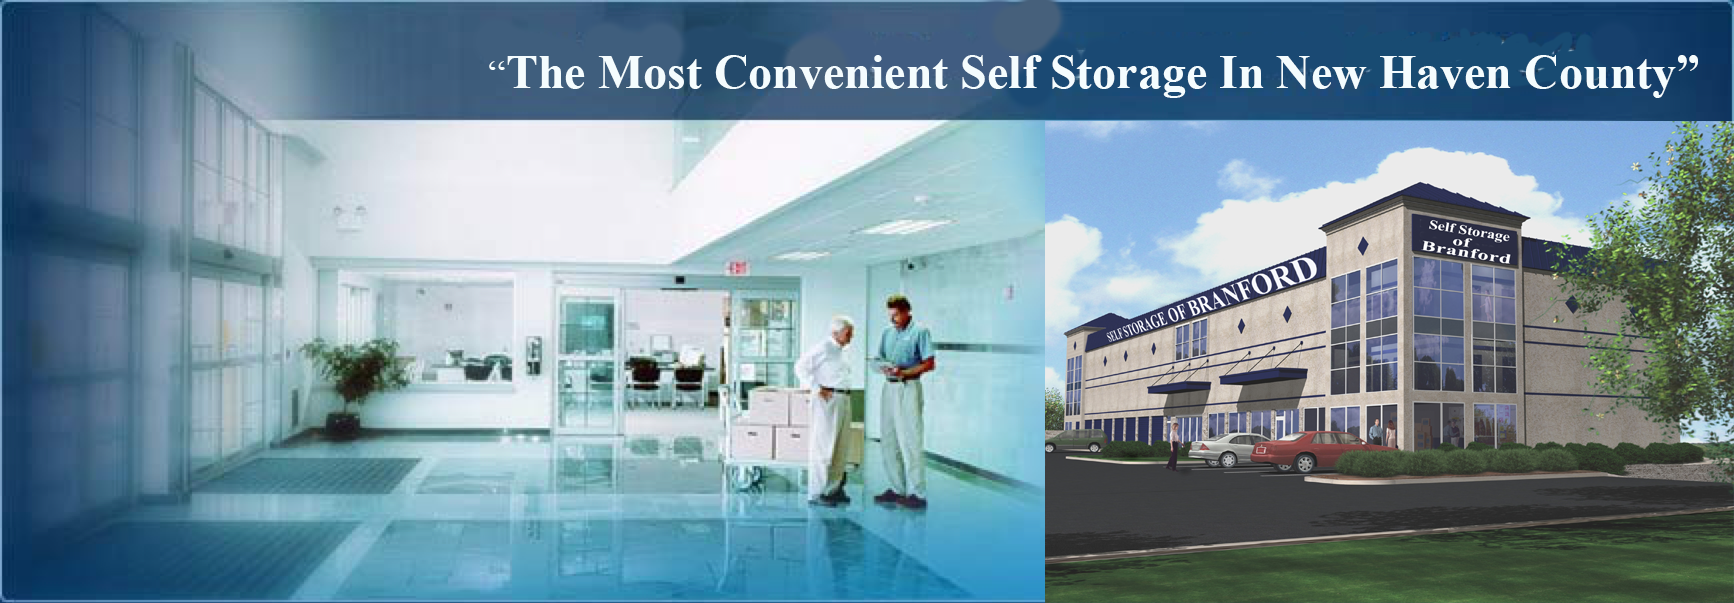 Self Storage of Branford image 3